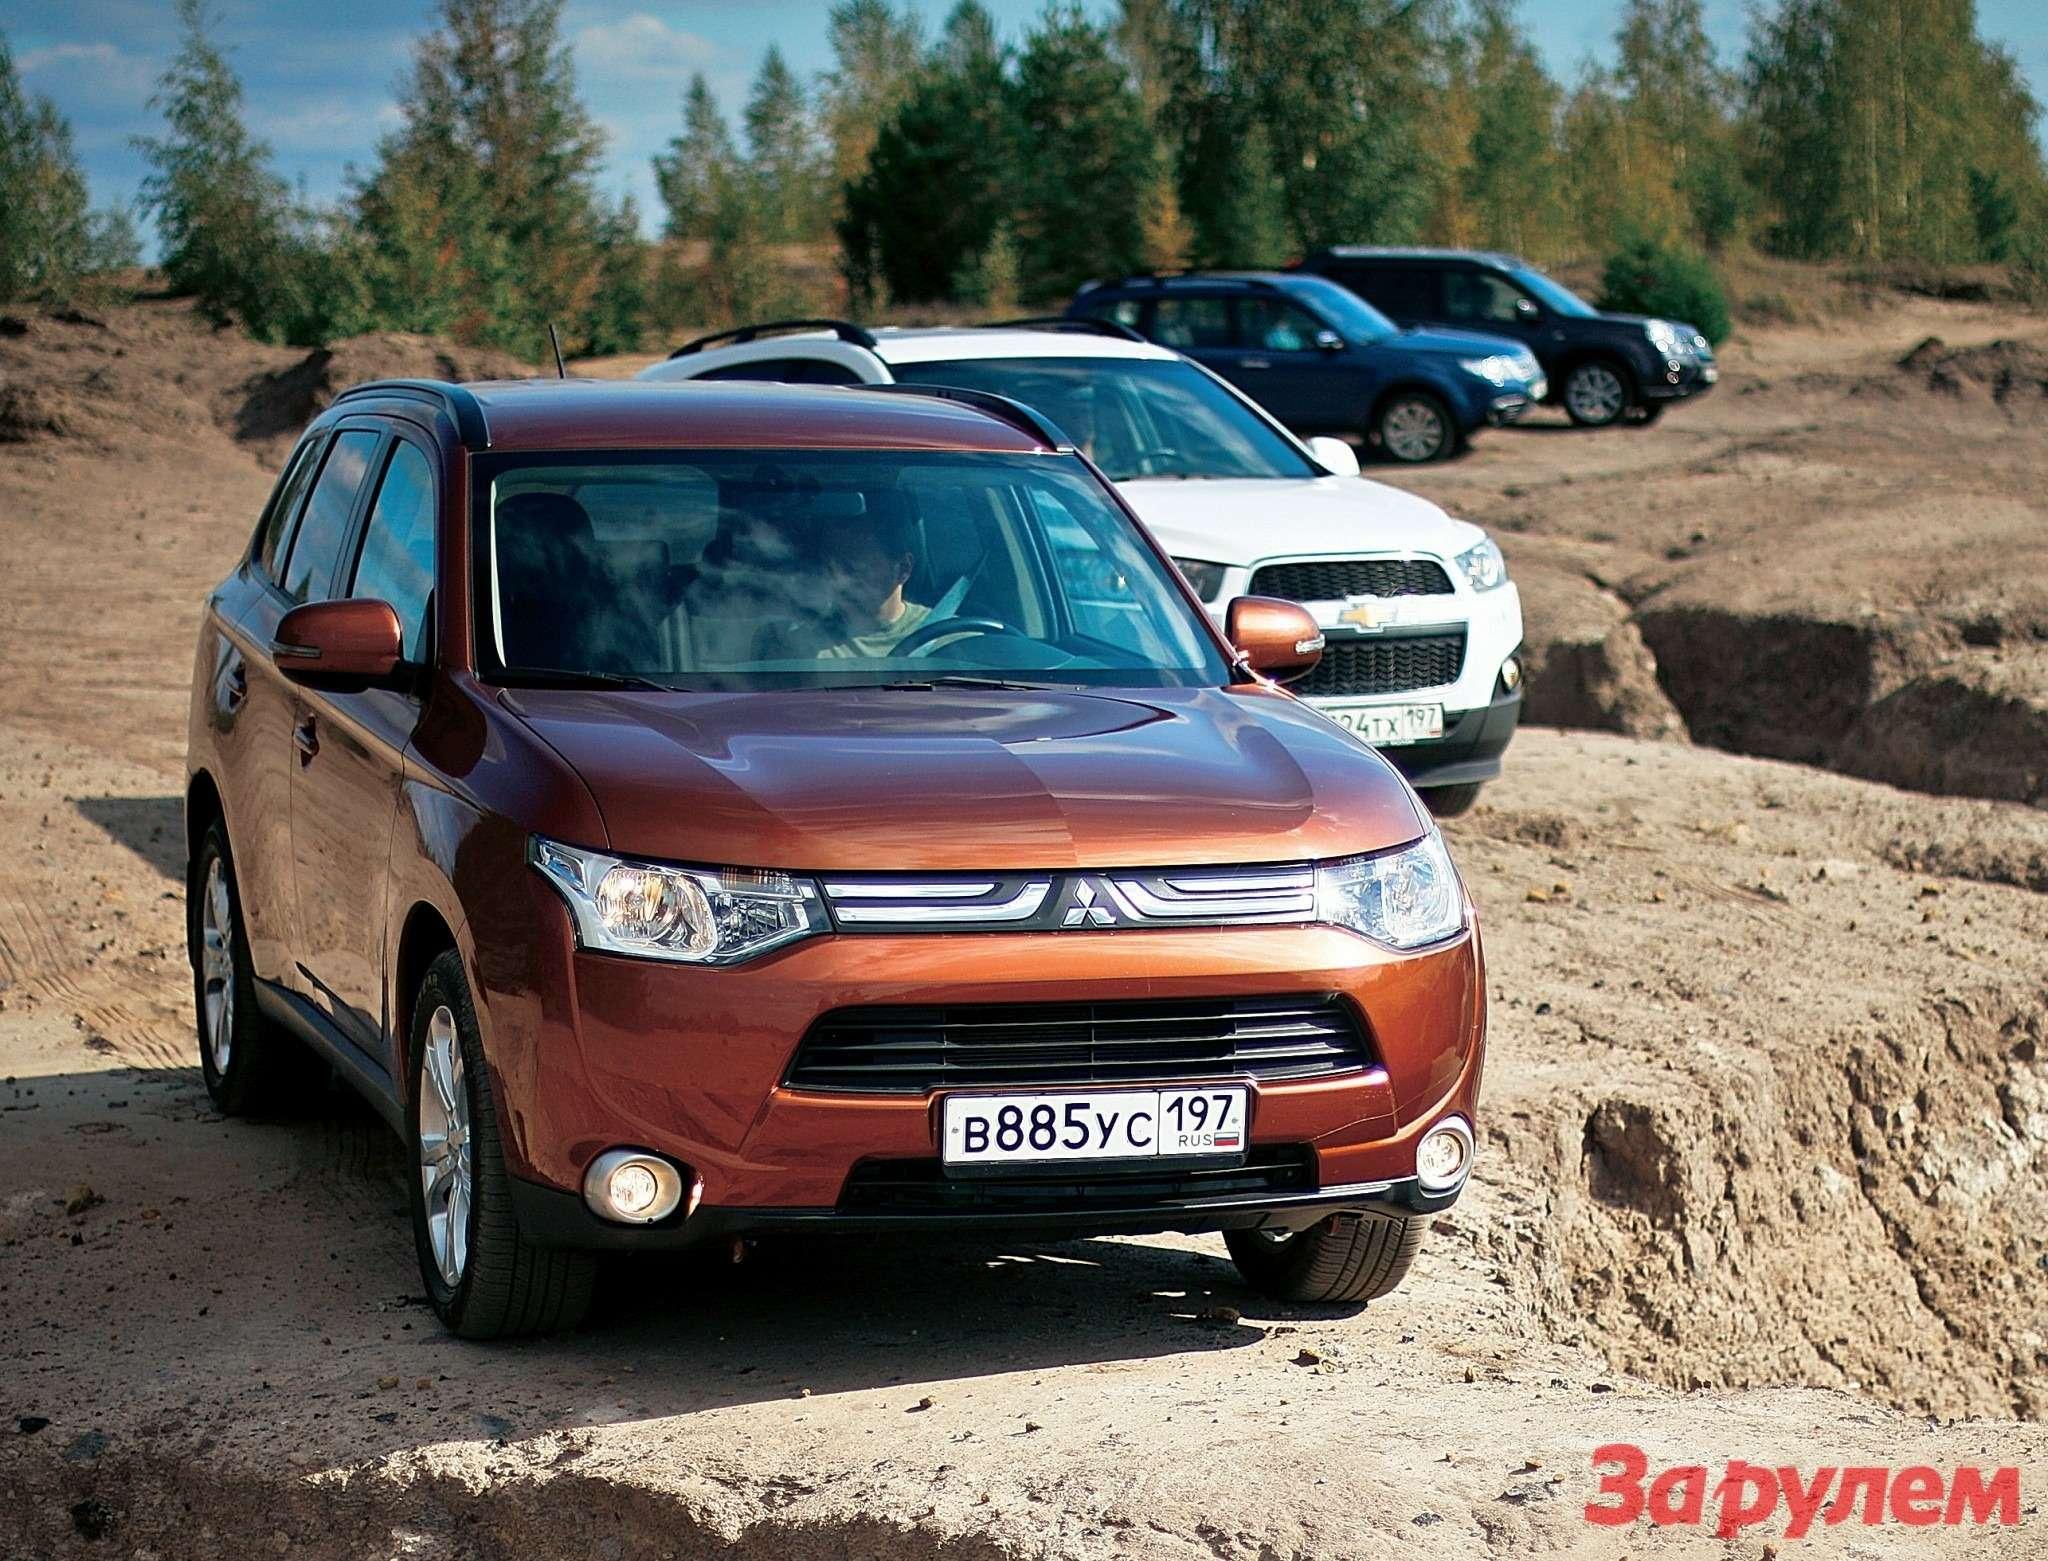 Subaru Forester, Chevrolet Captiva, Nissan XTrail, Mitsubishi Outlander